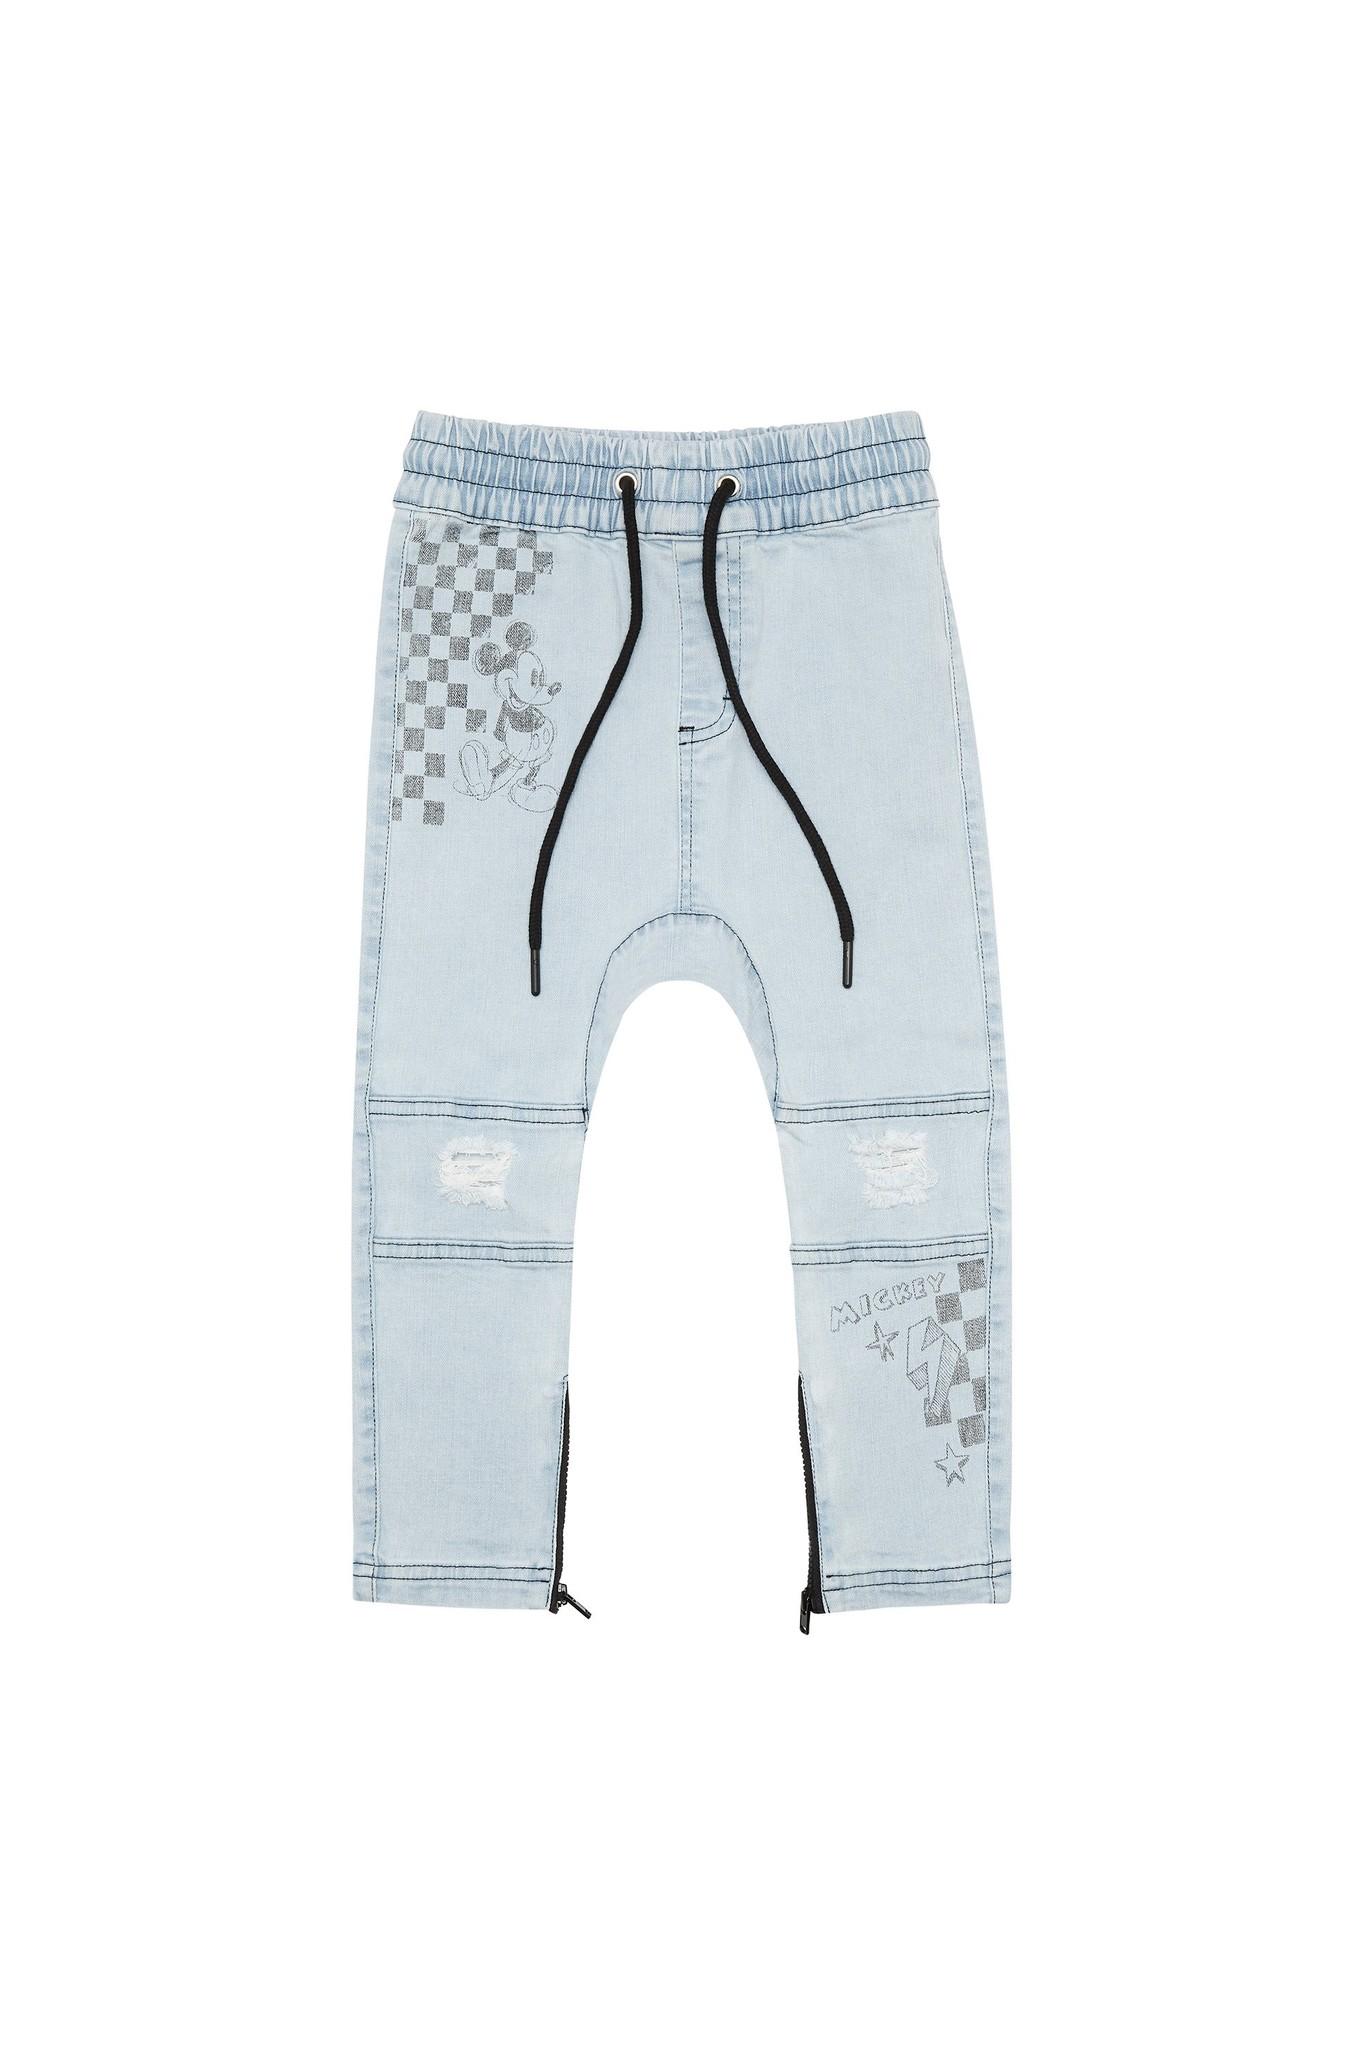 Adam + Yve LIGHT BLUE DROP CROTCH DENIM | JEANS FOR BOYS | CHILDREN'S CLOTHING